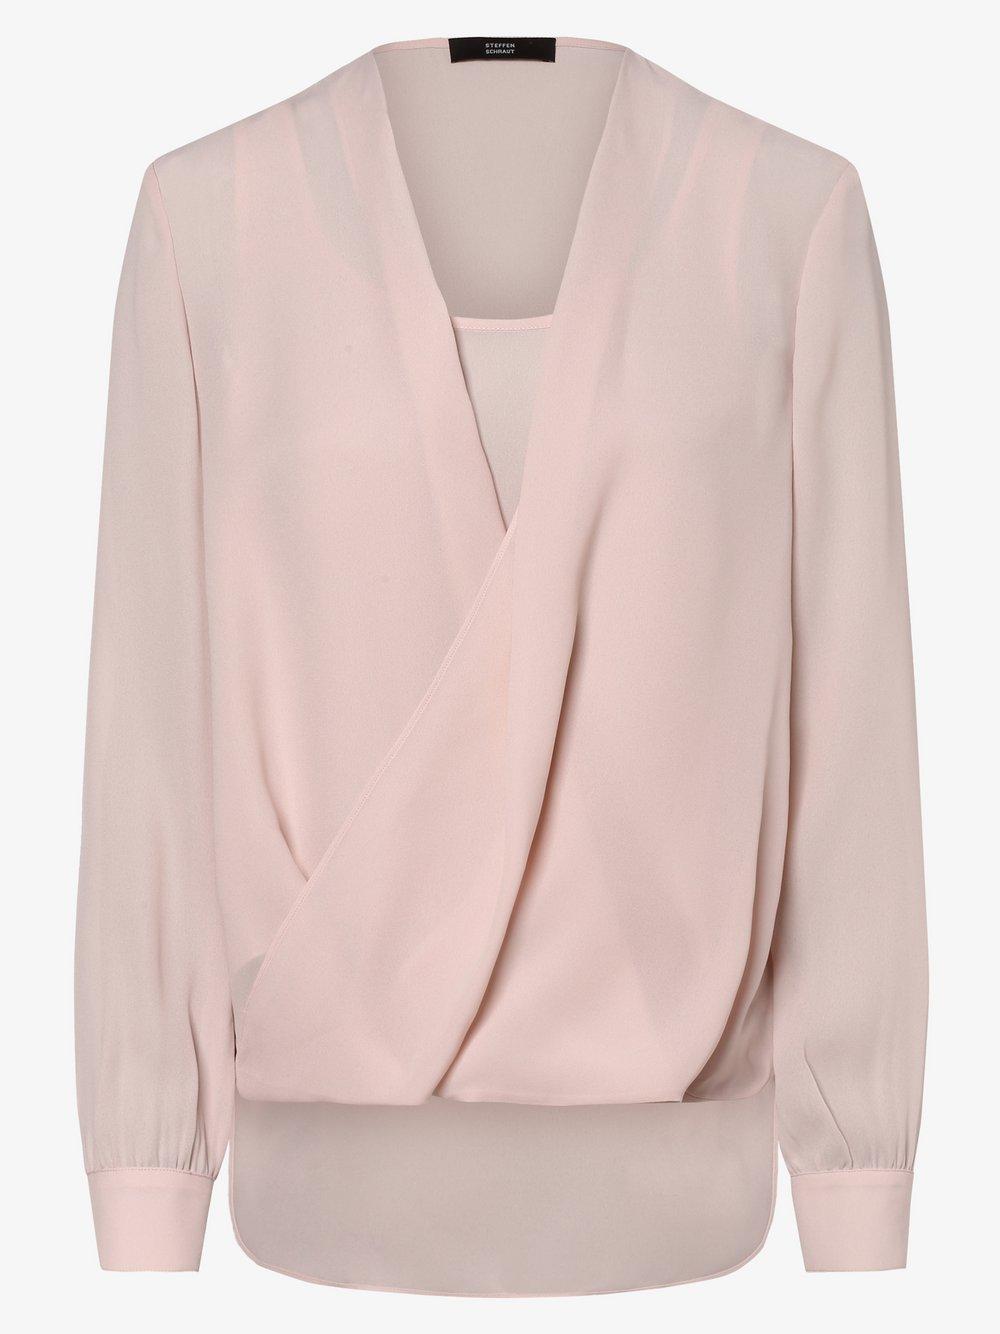 STEFFEN SCHRAUT – Bluzka damska, różowy Van Graaf 462154-0002-00360